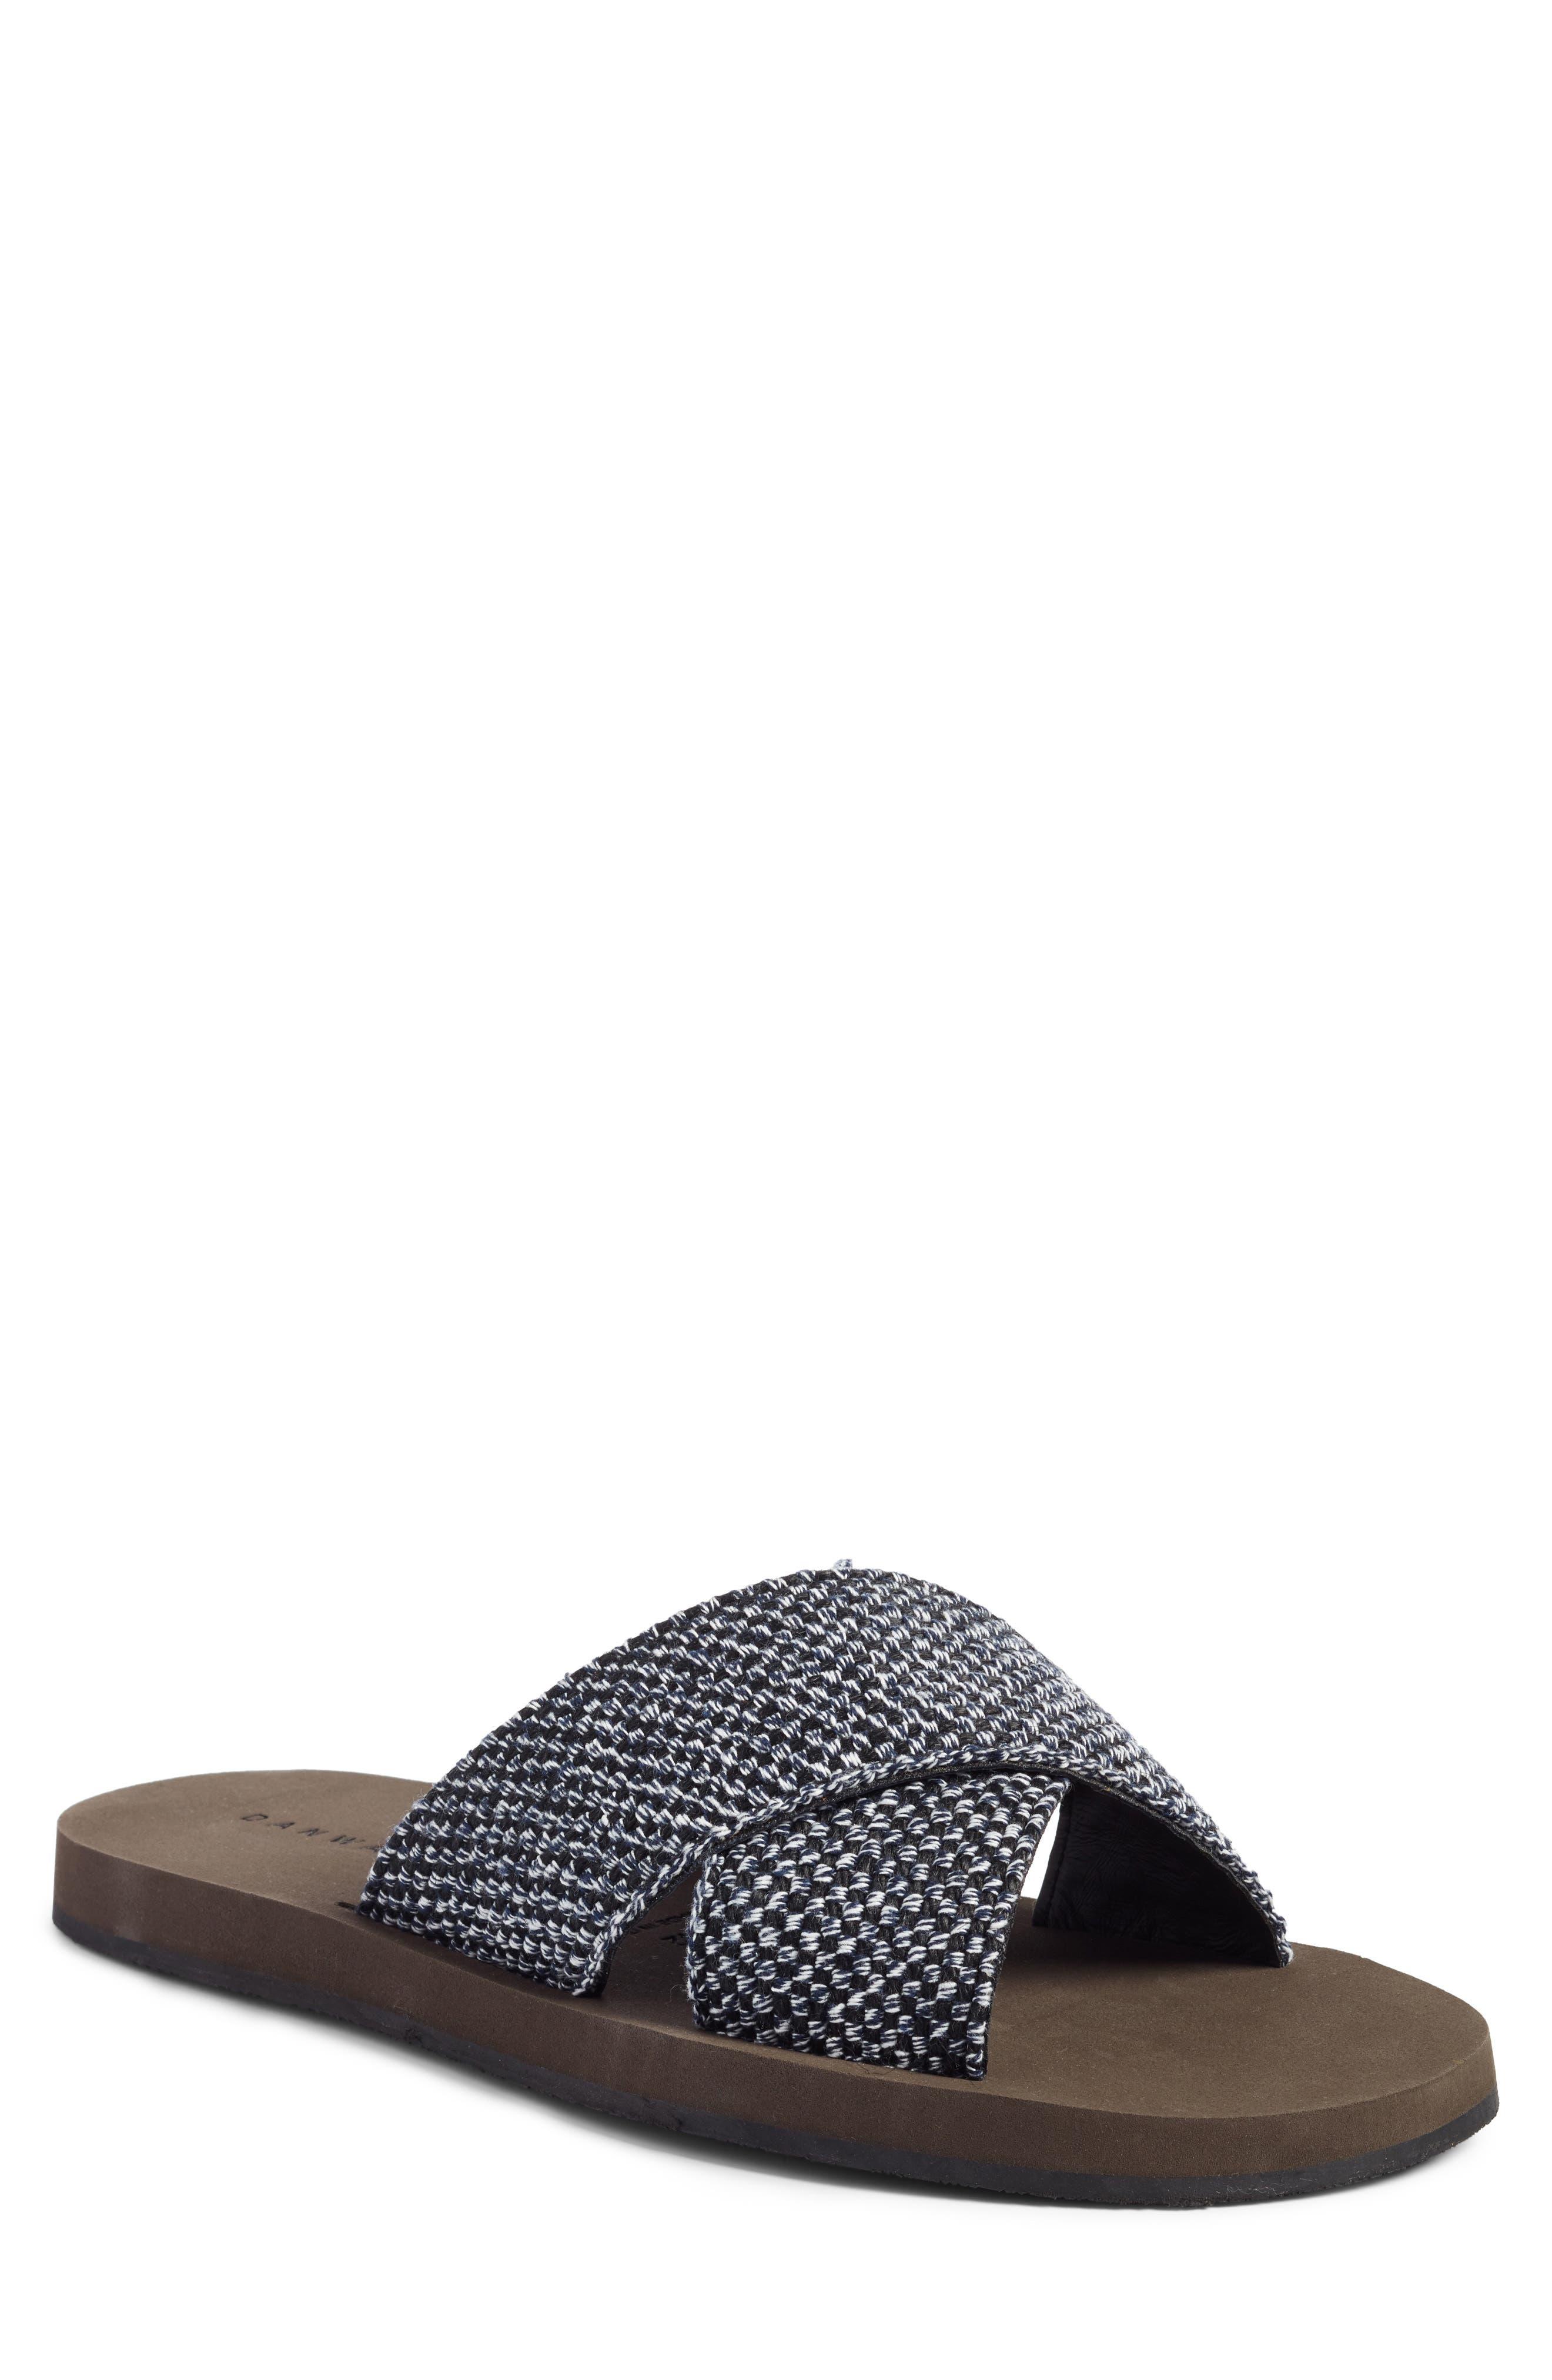 Alternate Image 1 Selected - DANWARD Criss Cross Slide Sandal (Men)